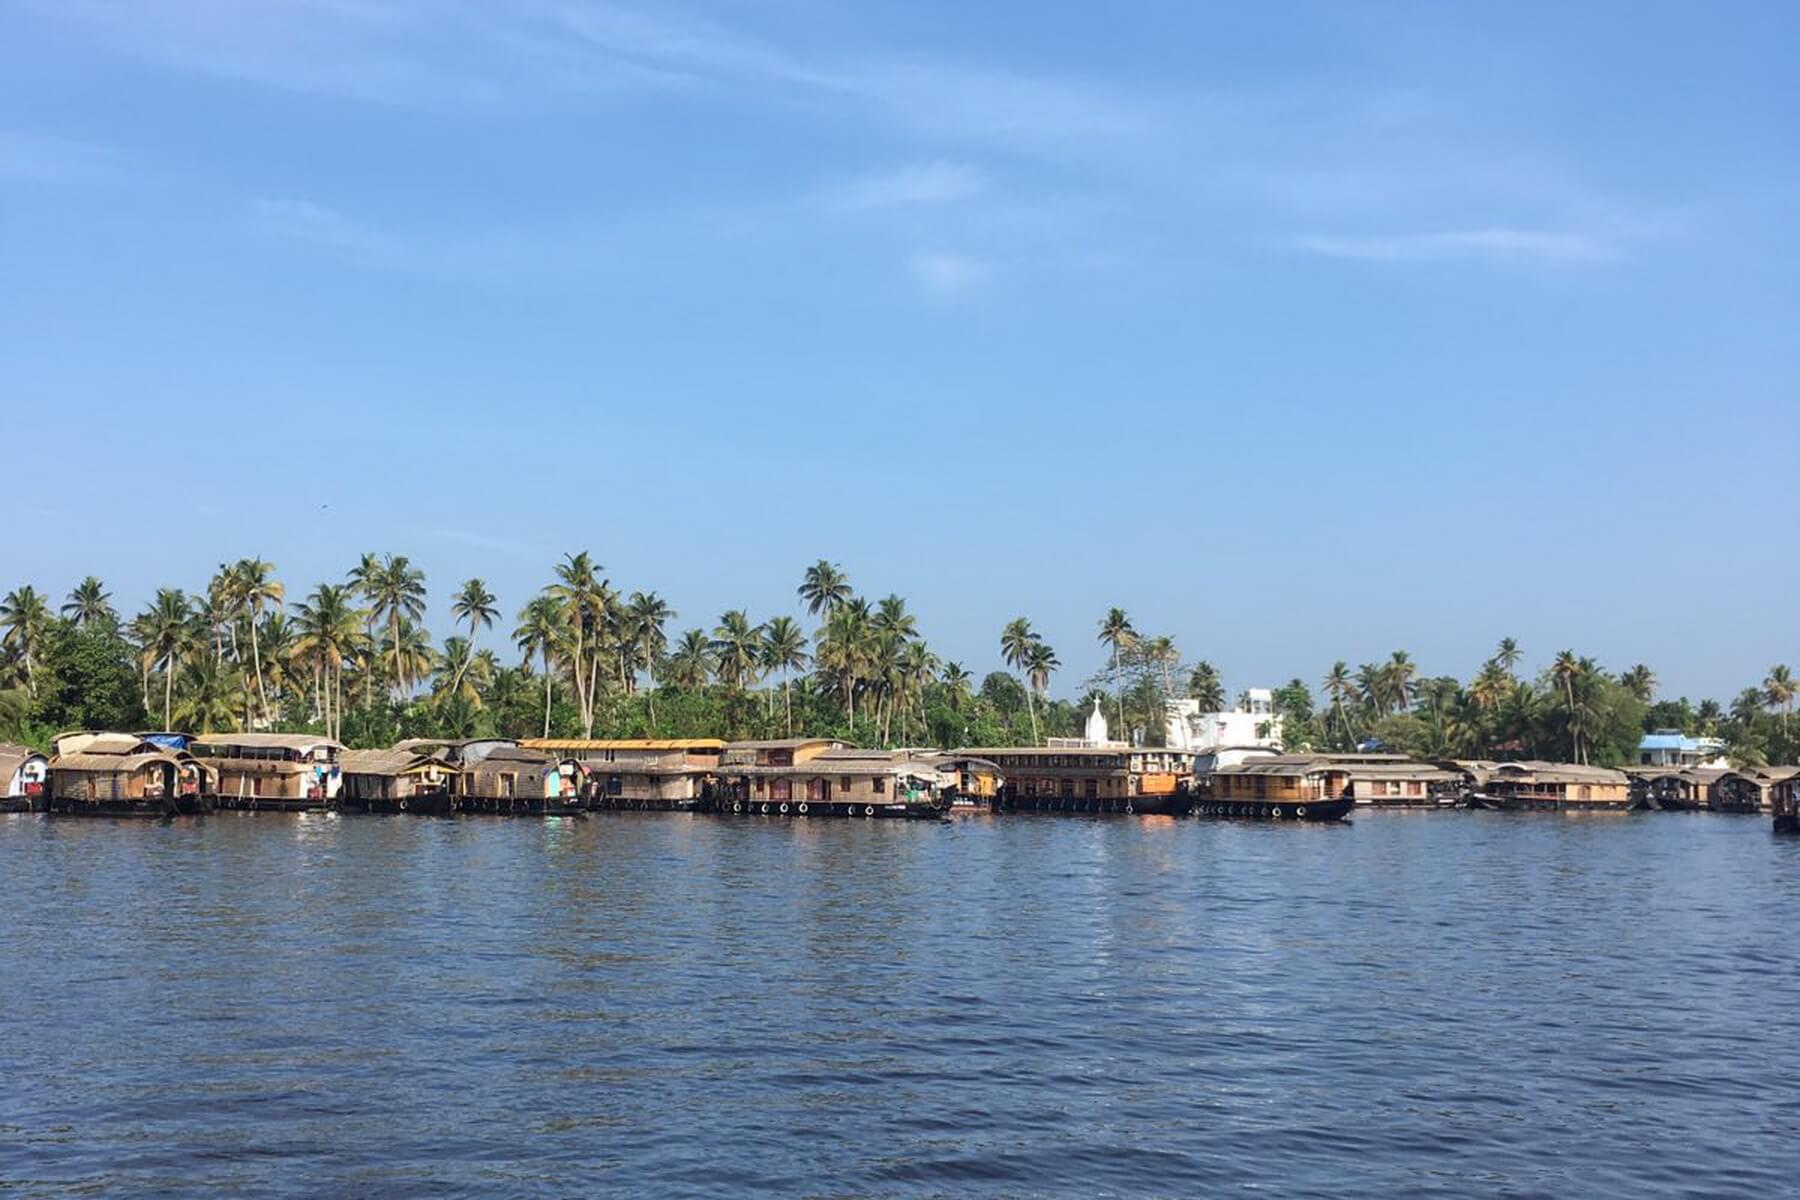 Hausboothafen auf den Backwaters in Kerala